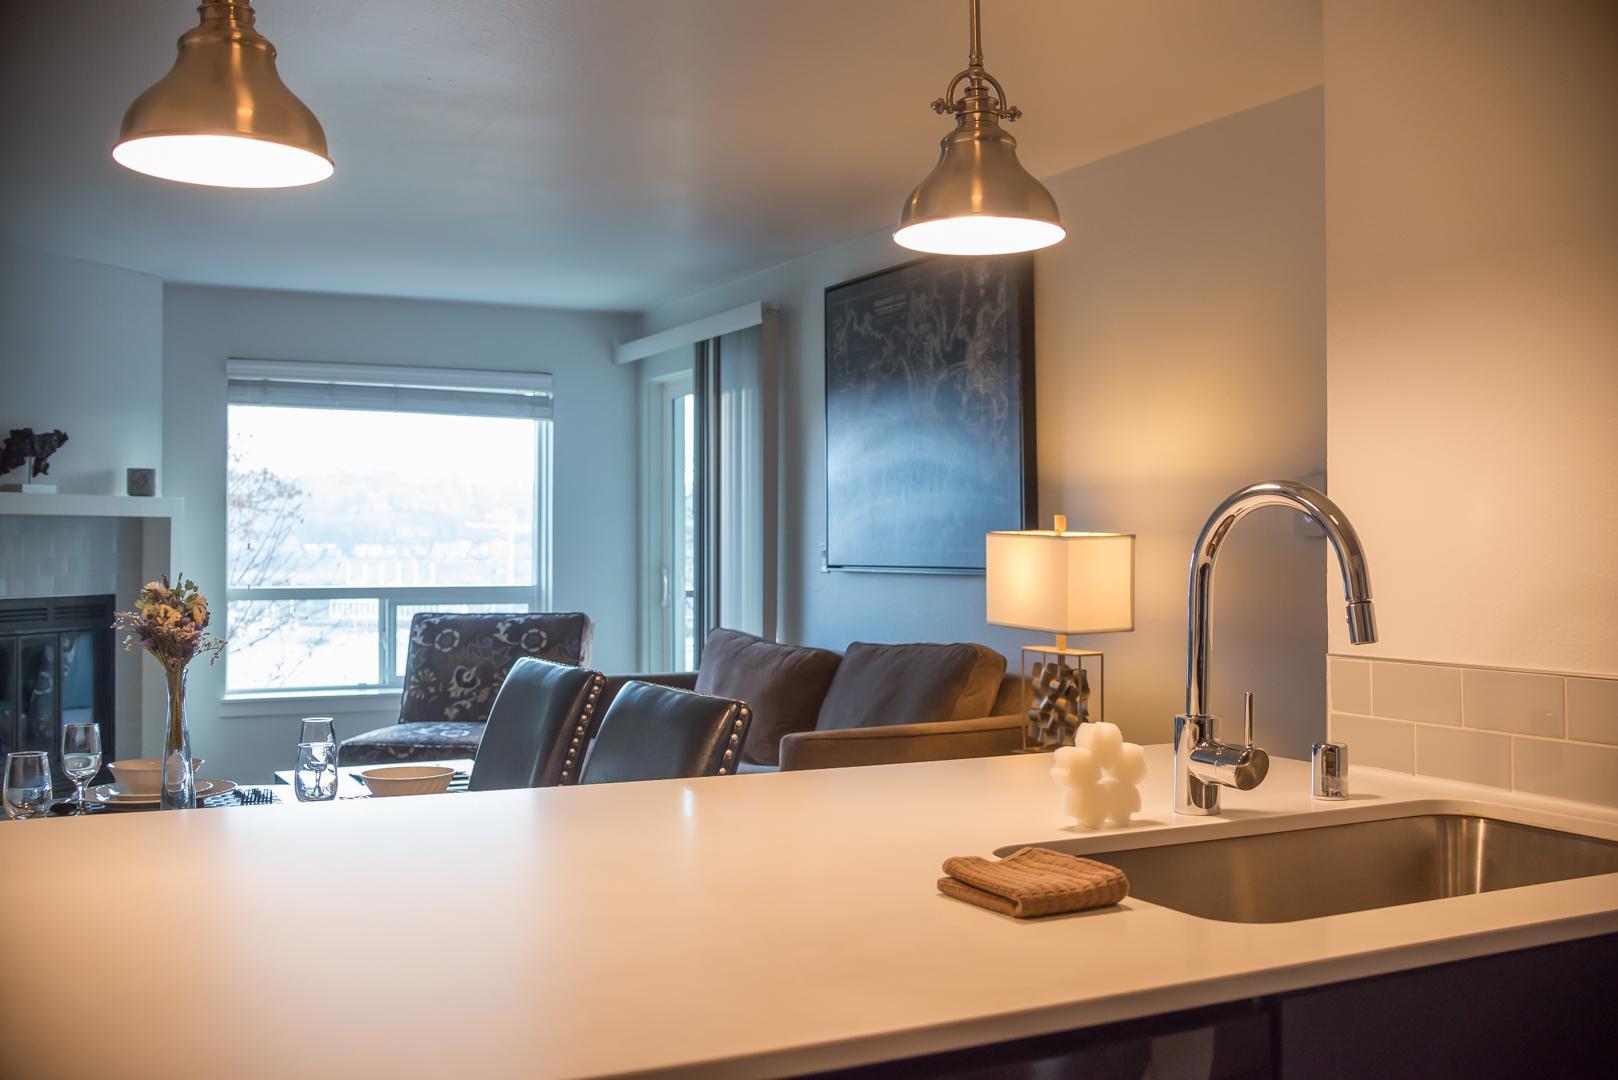 Eden 416 · SoBe Westlake Apartments 2 Bedroom